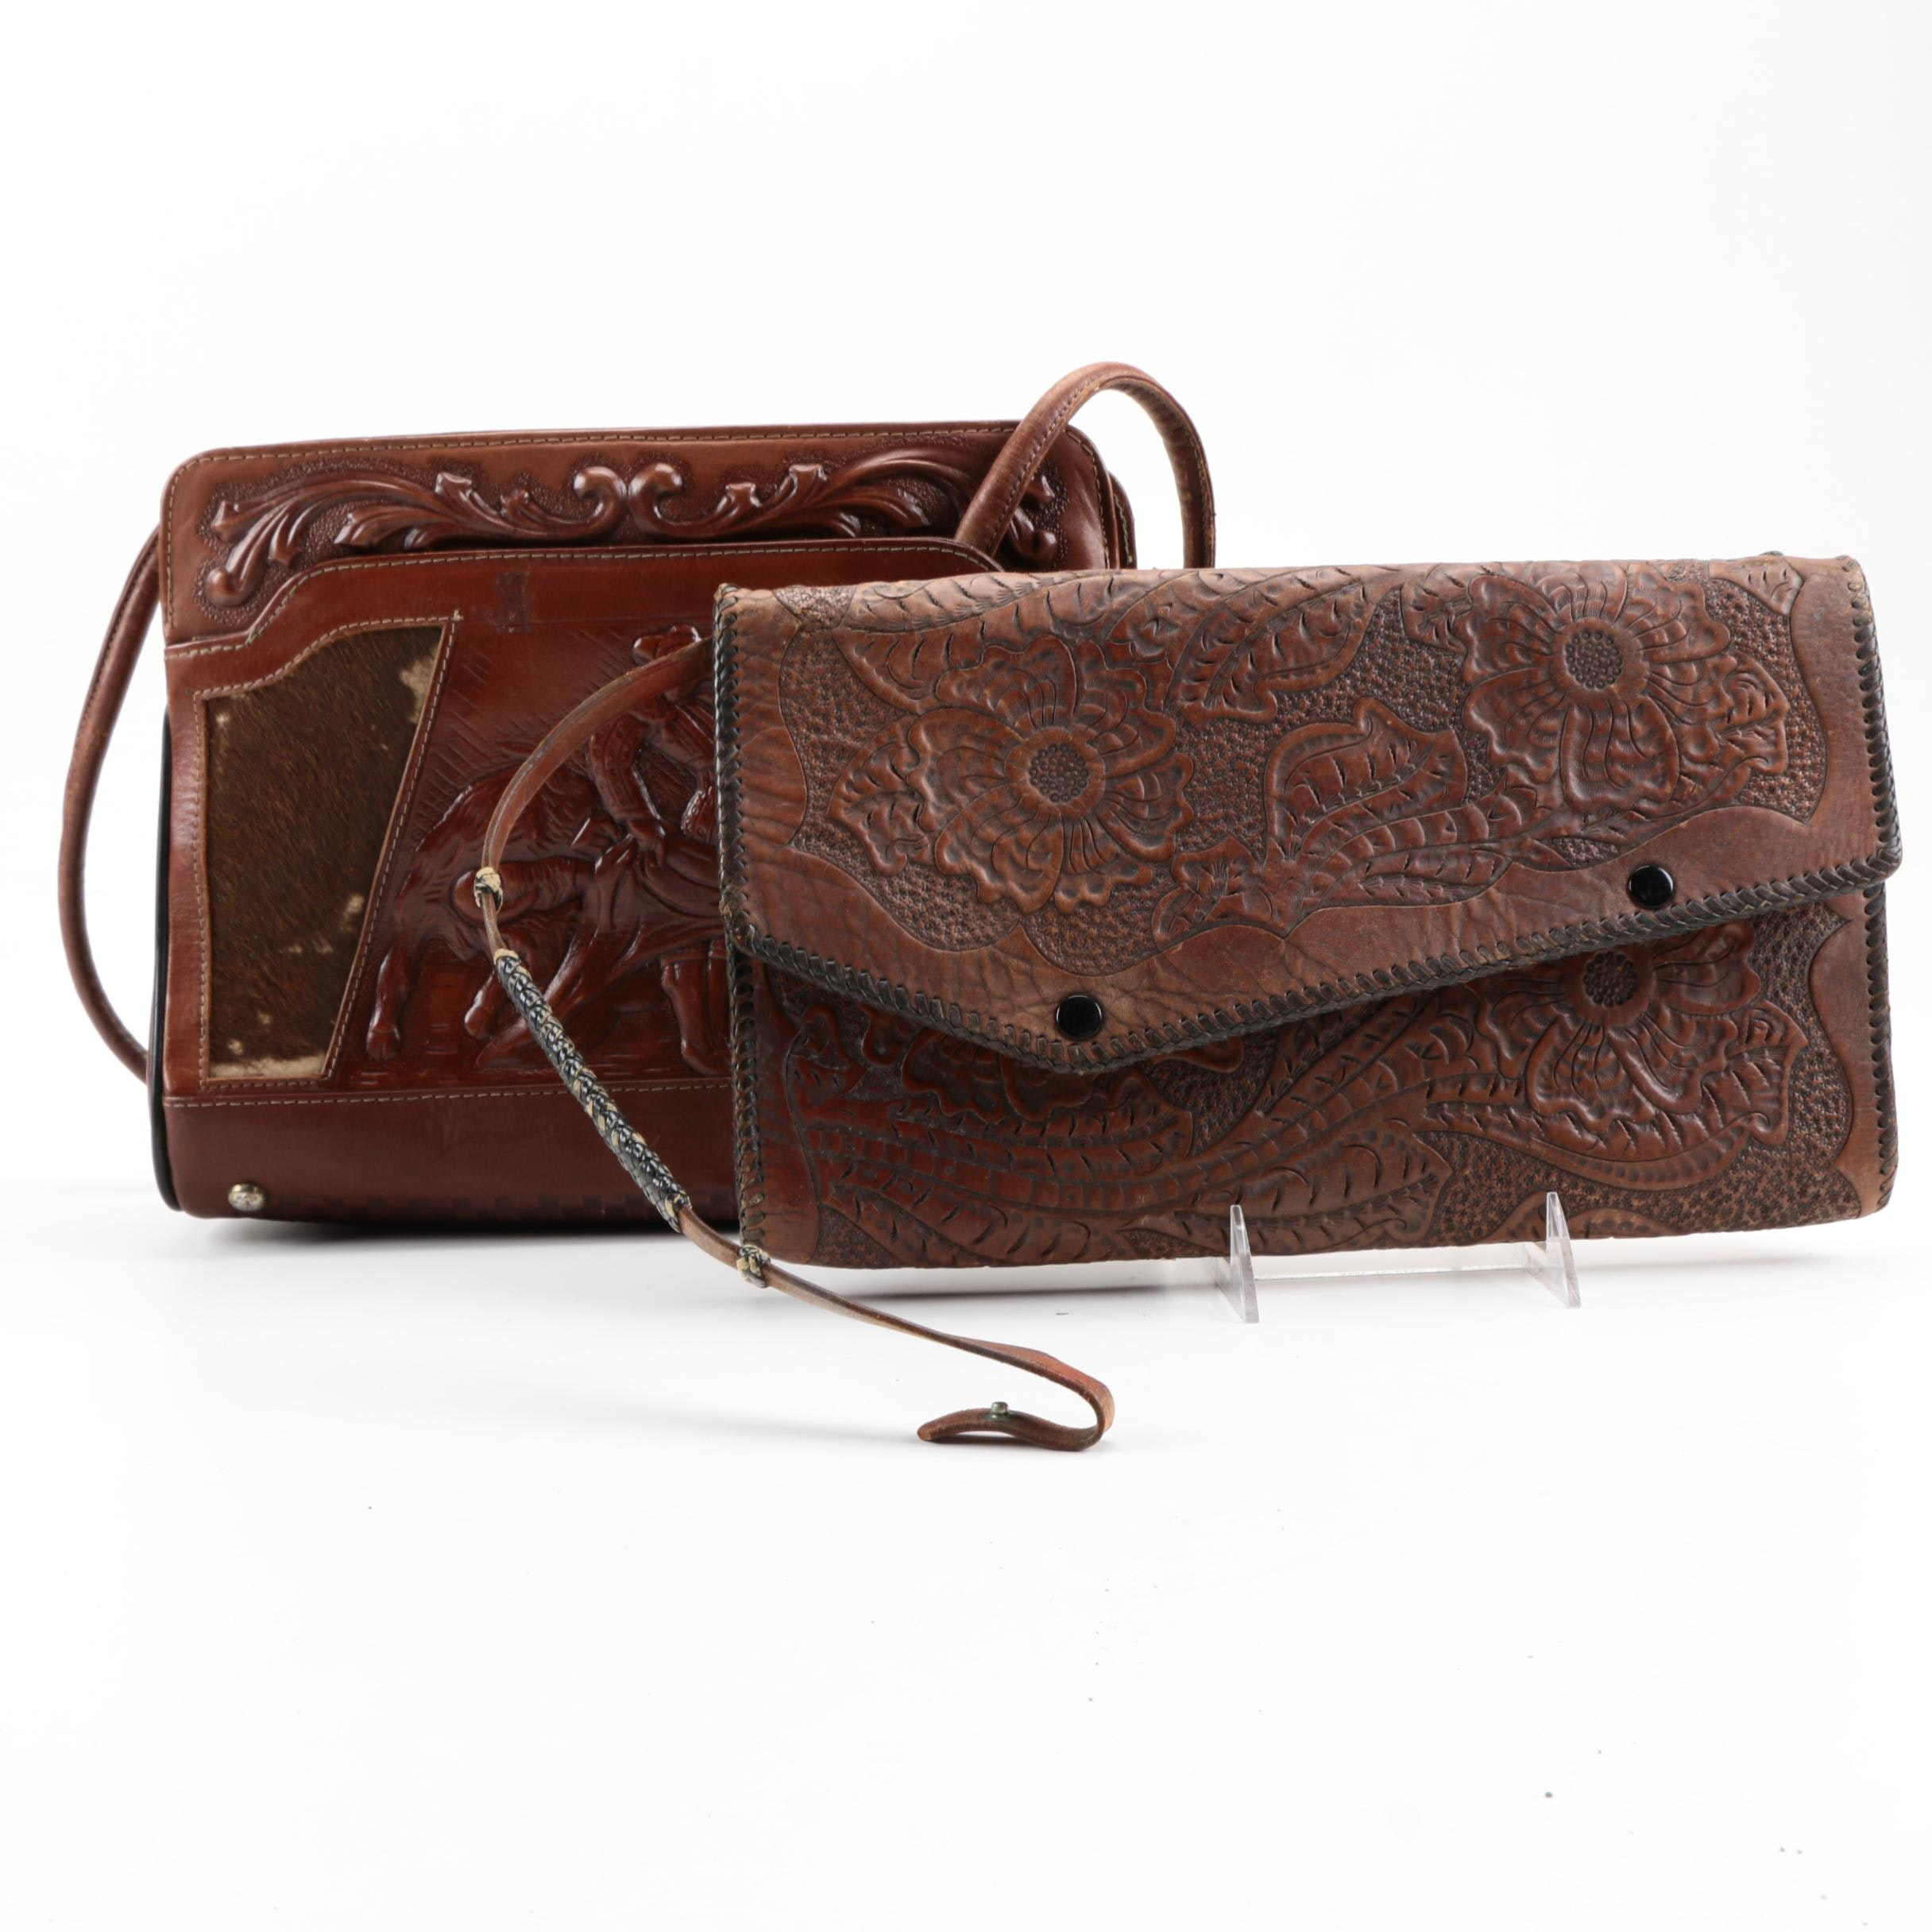 Vintage Tooled Brown Leather Handbags